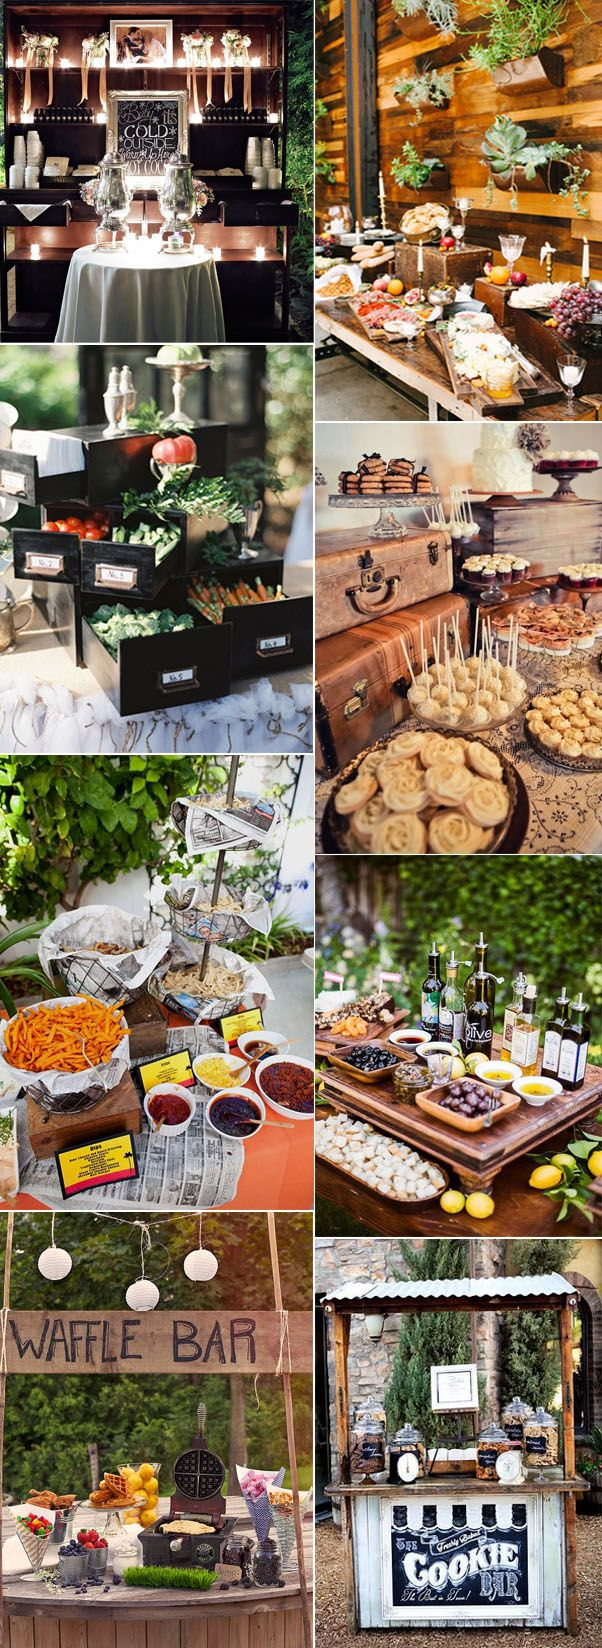 31 Admirable Rustic Wedding Food And Drink Bar Ideas Elegantweddinginvites Com Blog Rustic Wedding Foods Wedding Buffet Food Wedding Reception Food